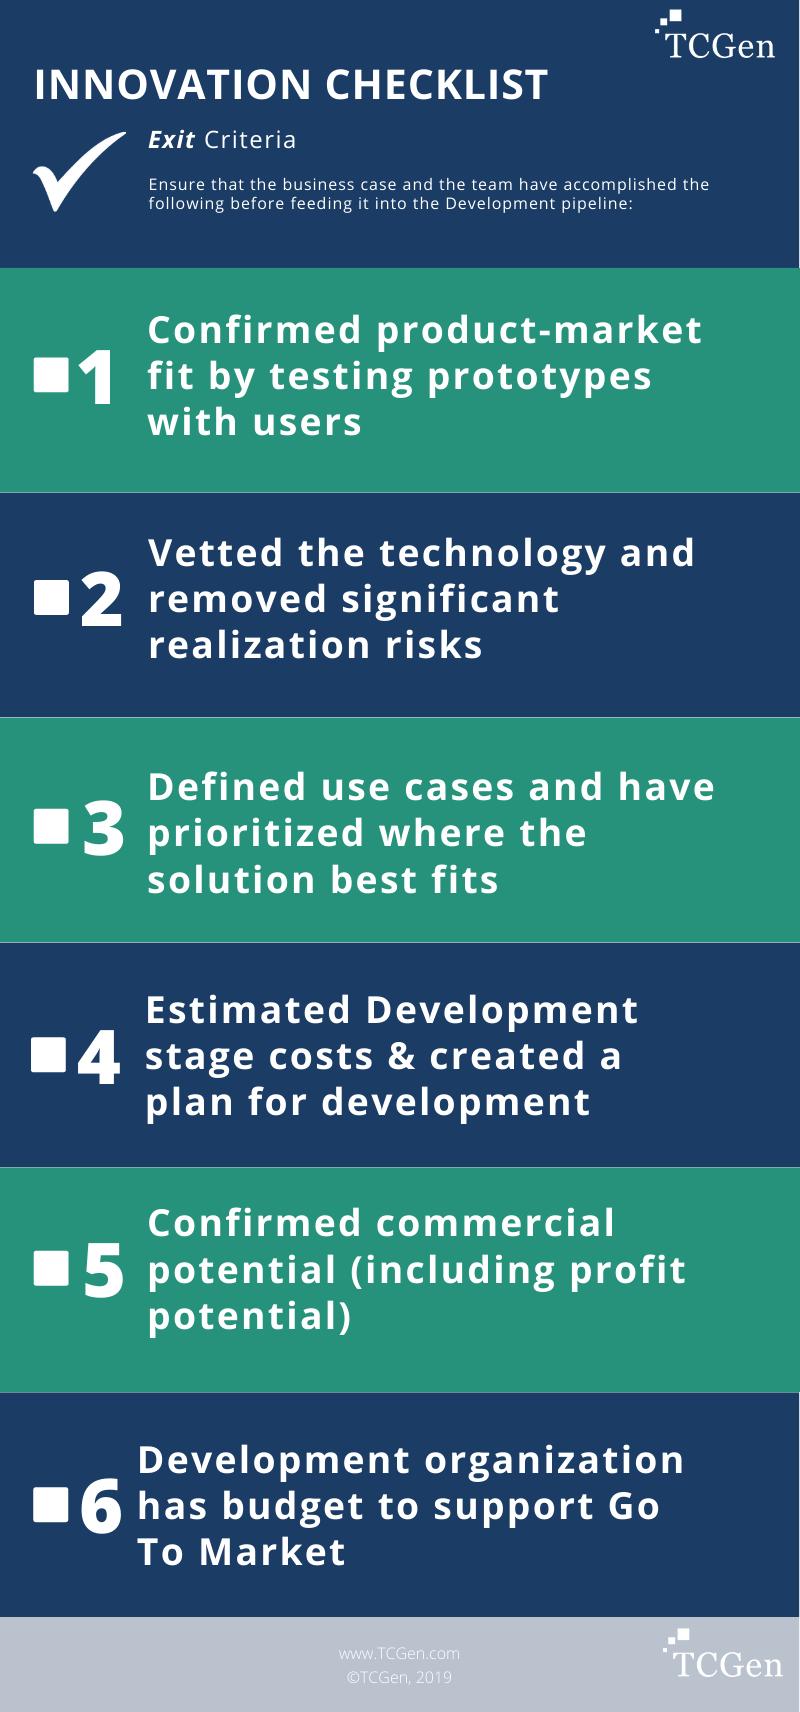 Innovation Checklist: Exit Criteria